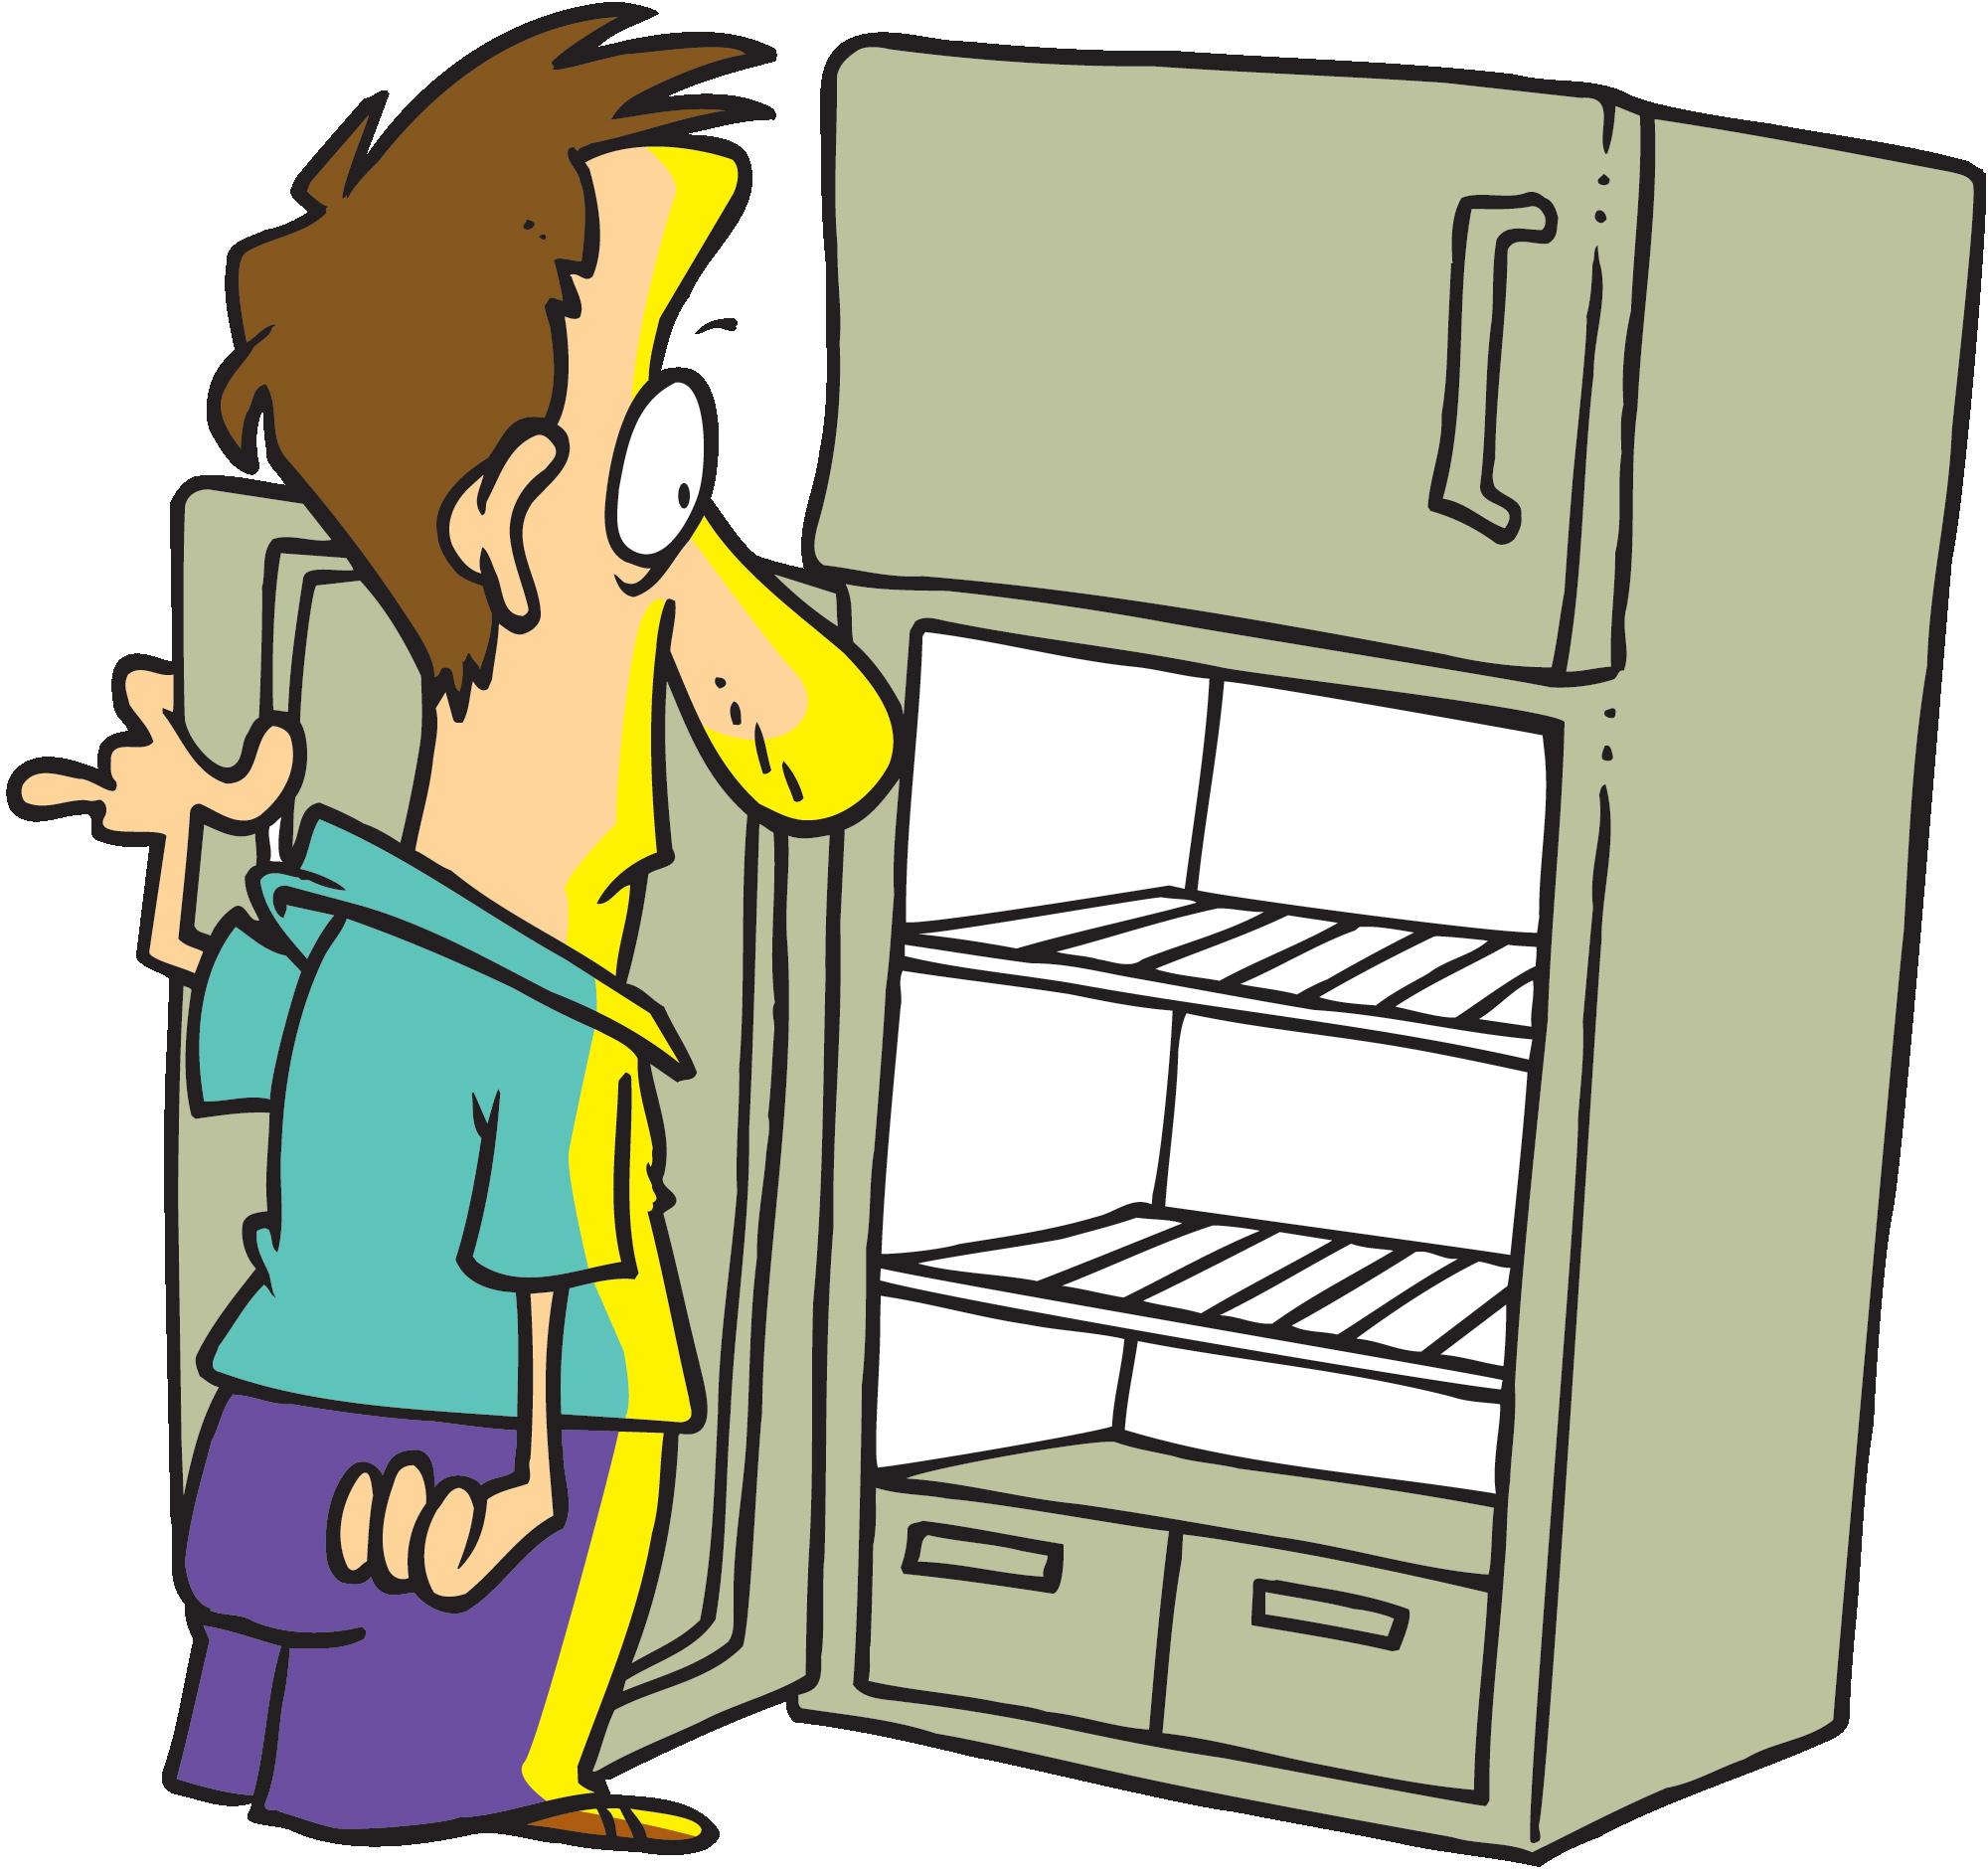 fridge Refrigerator open cliparts free download clip art jpg.